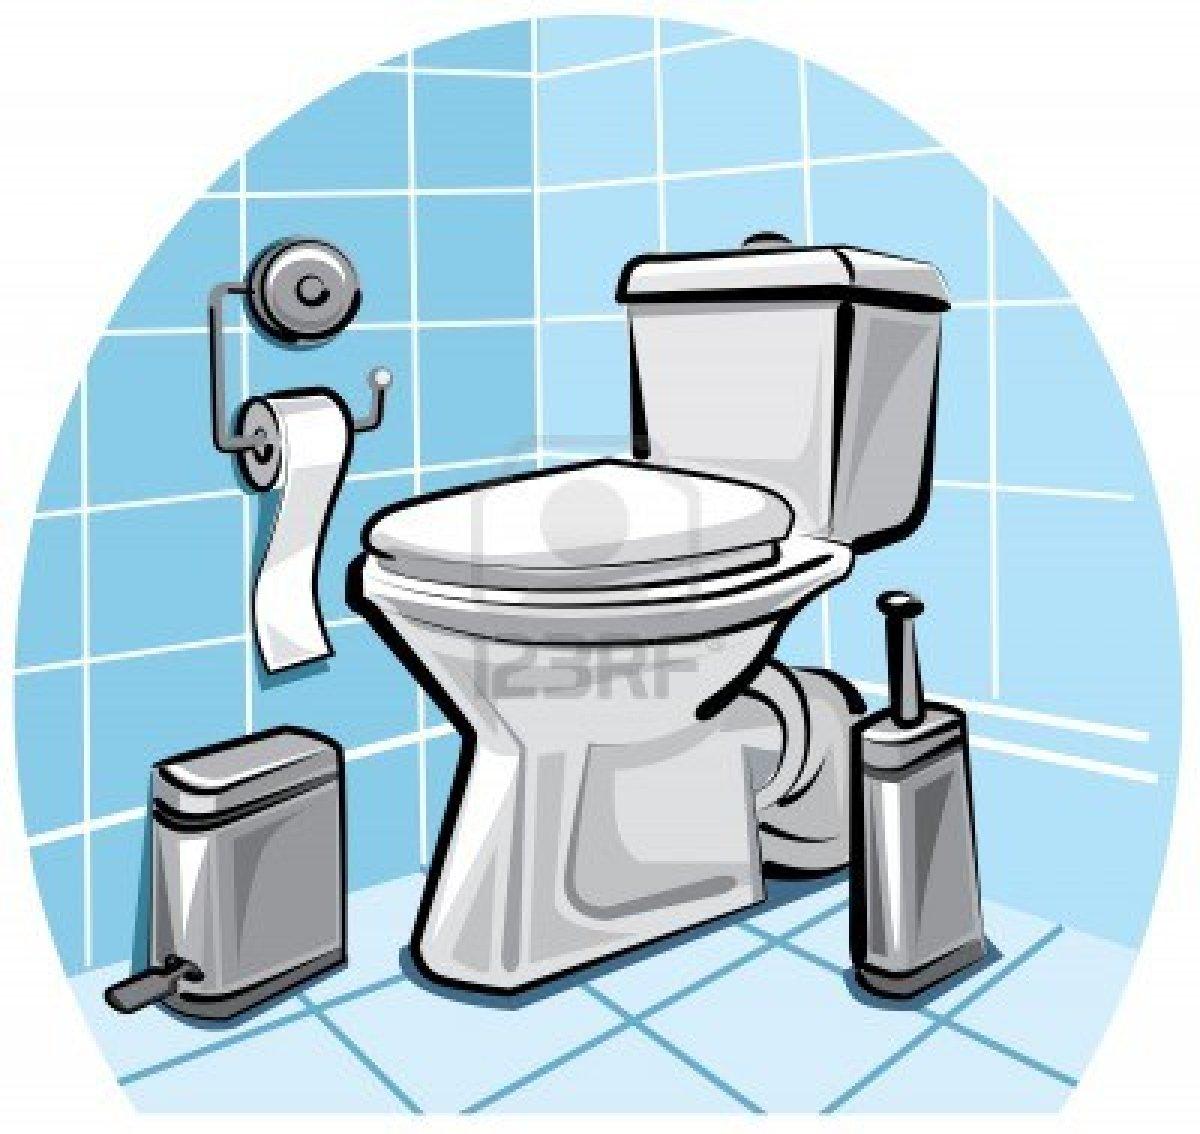 Cartoon Toilet Images Clipart